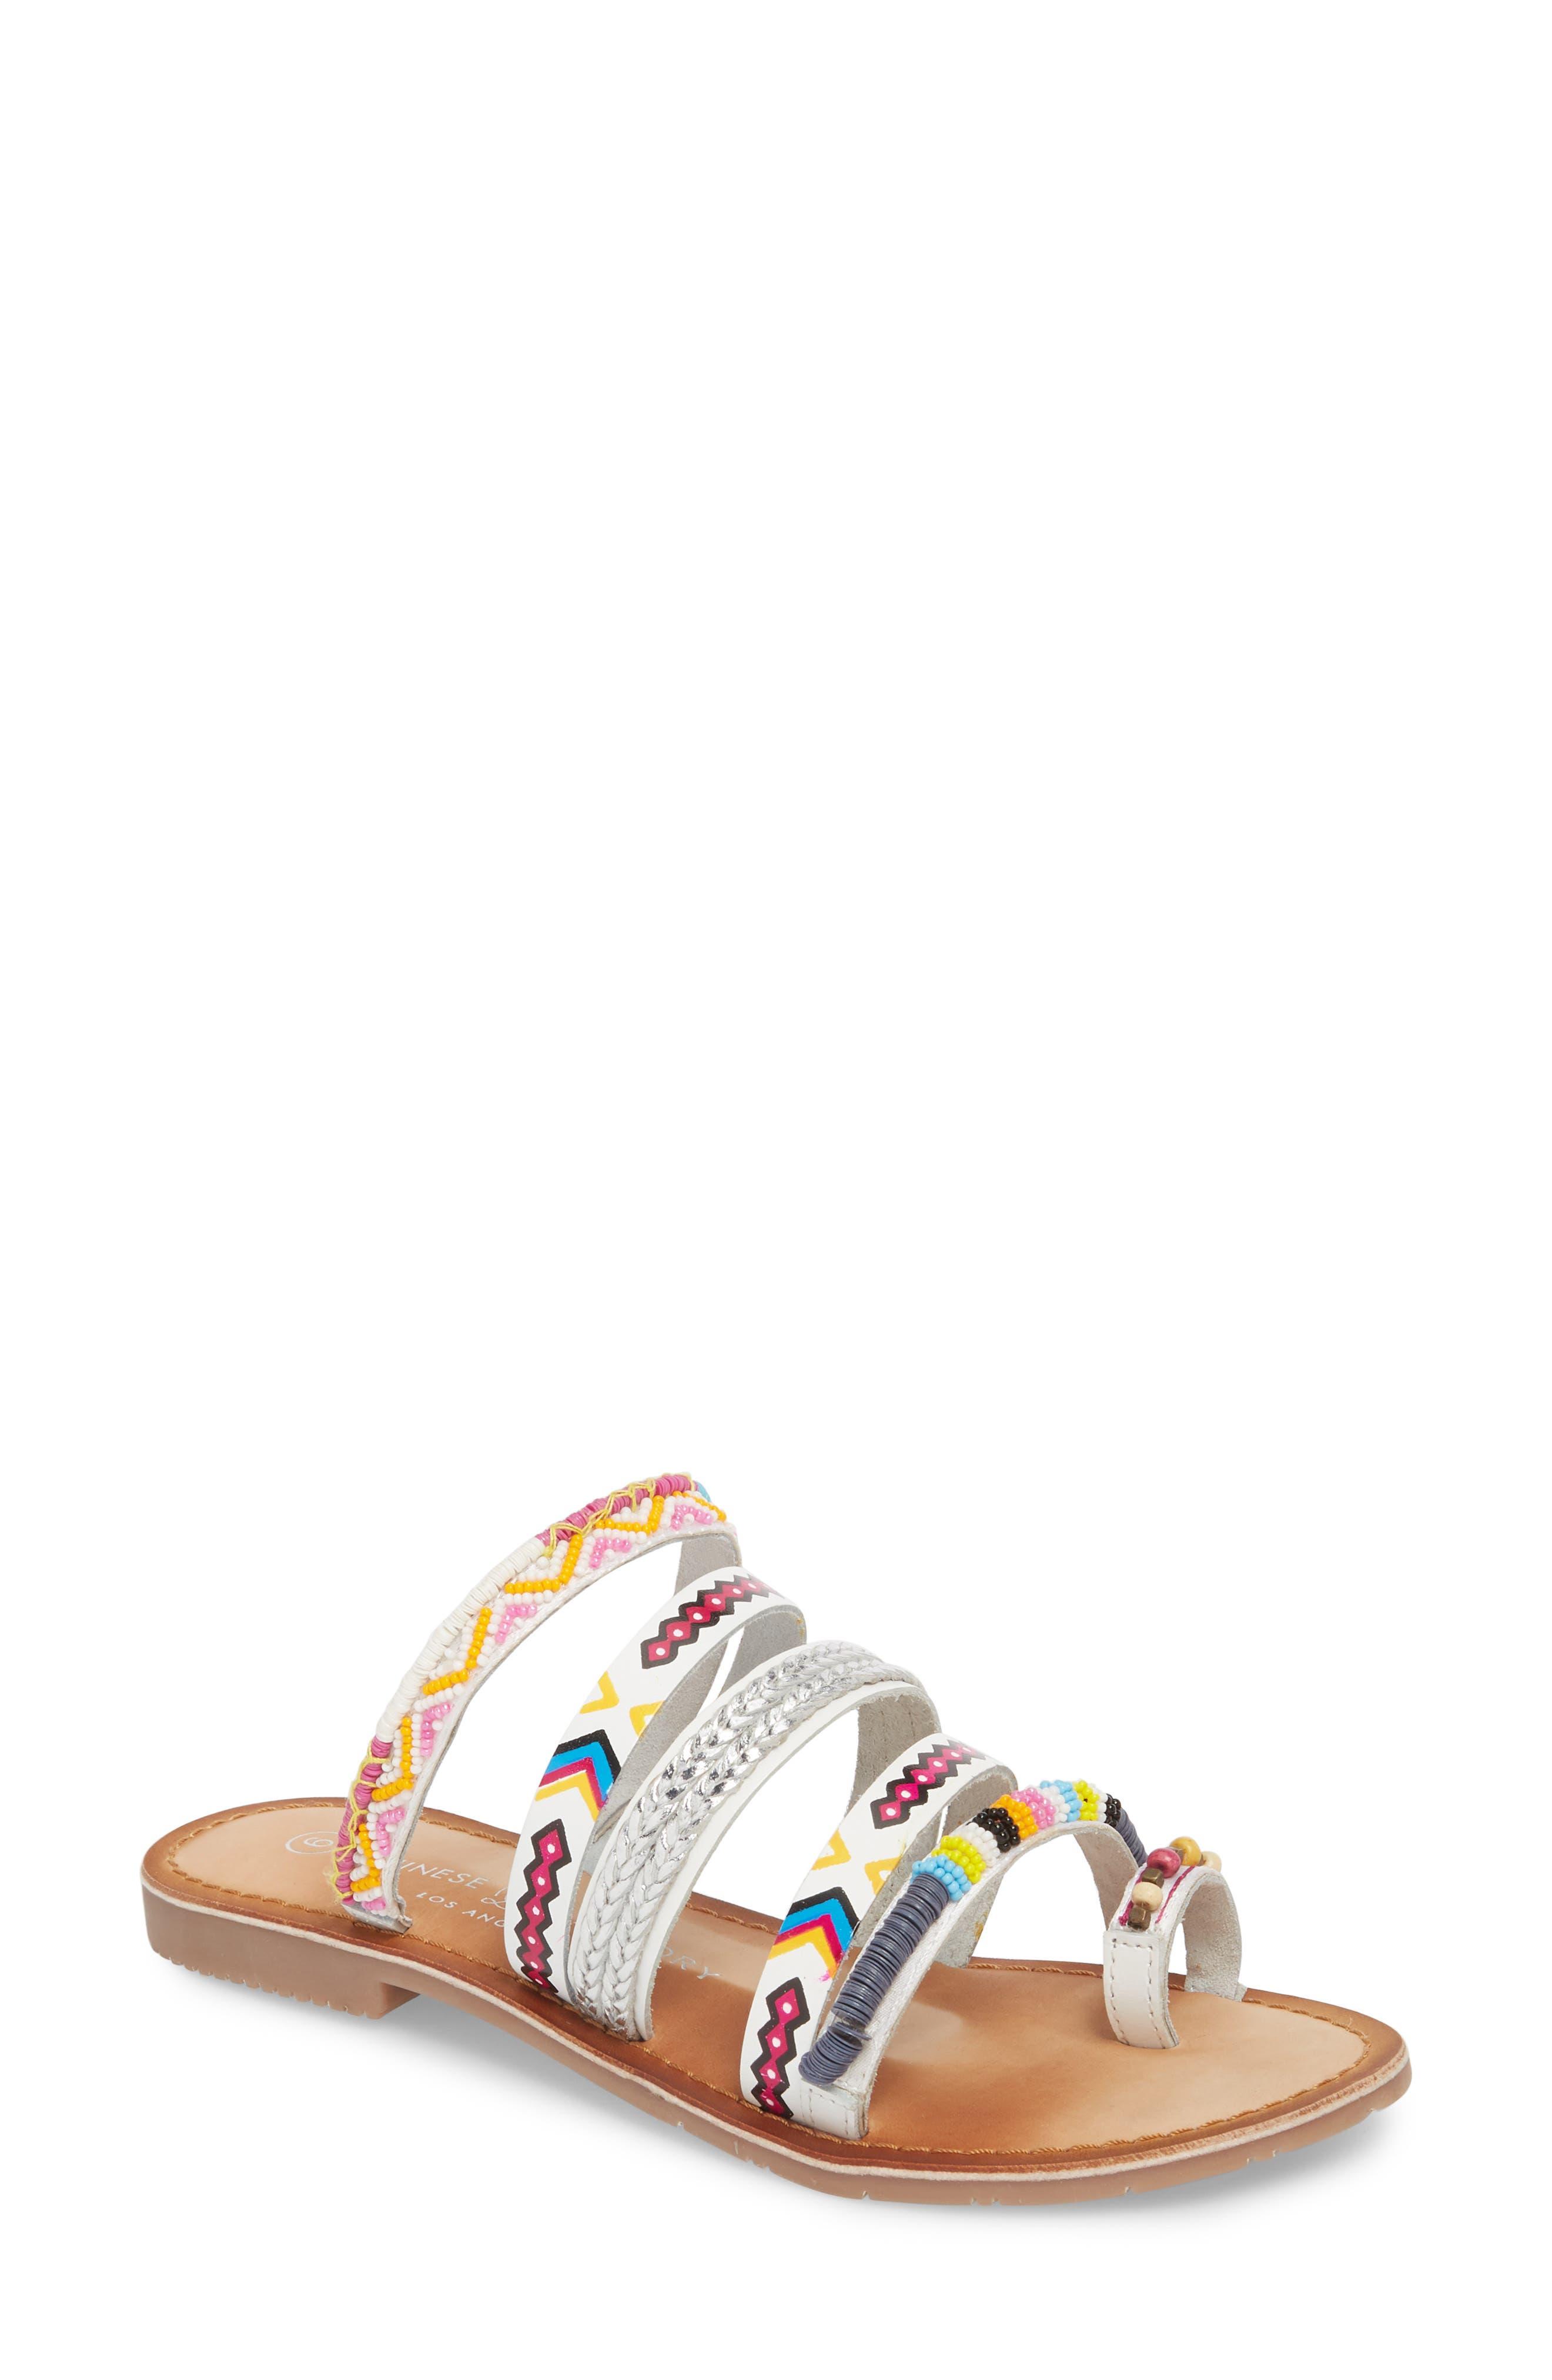 Pandora Embellished Slide Sandal,                             Main thumbnail 1, color,                             100